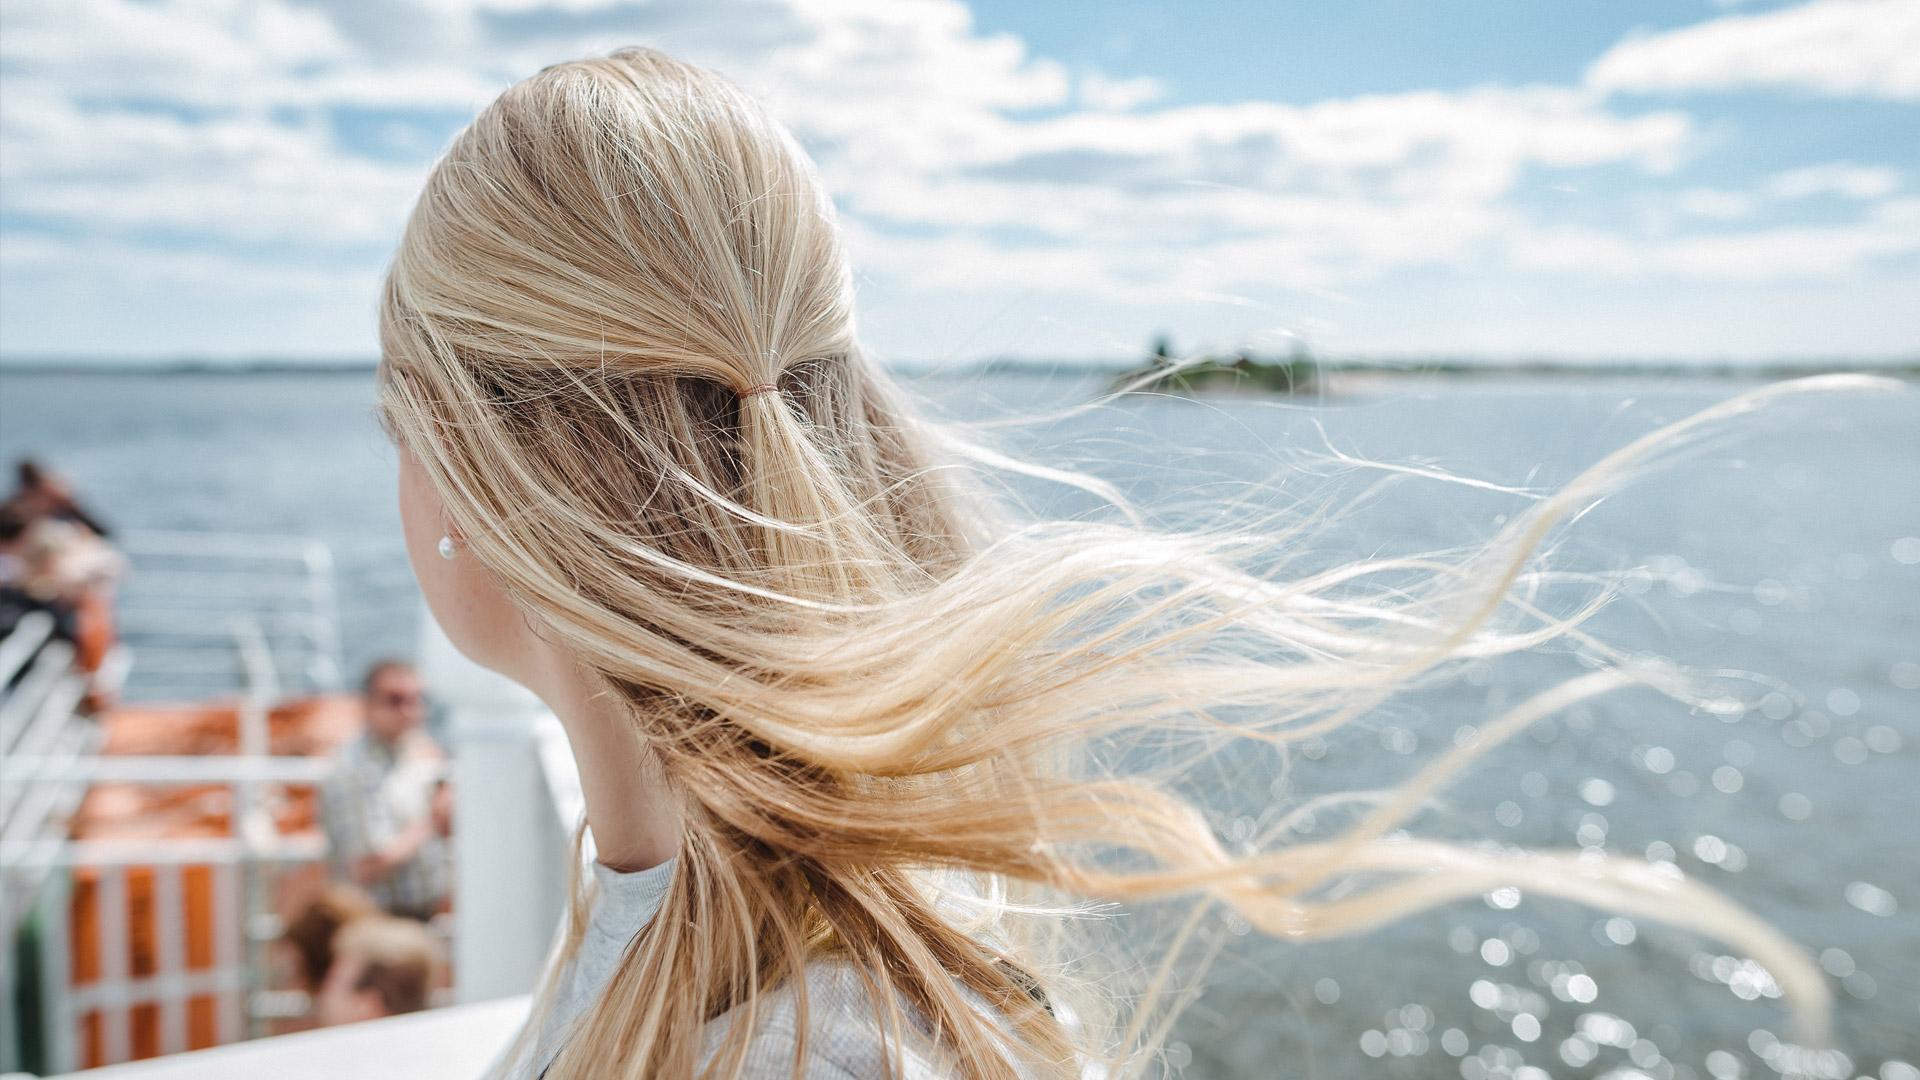 Suomenlinnan Island Hopping